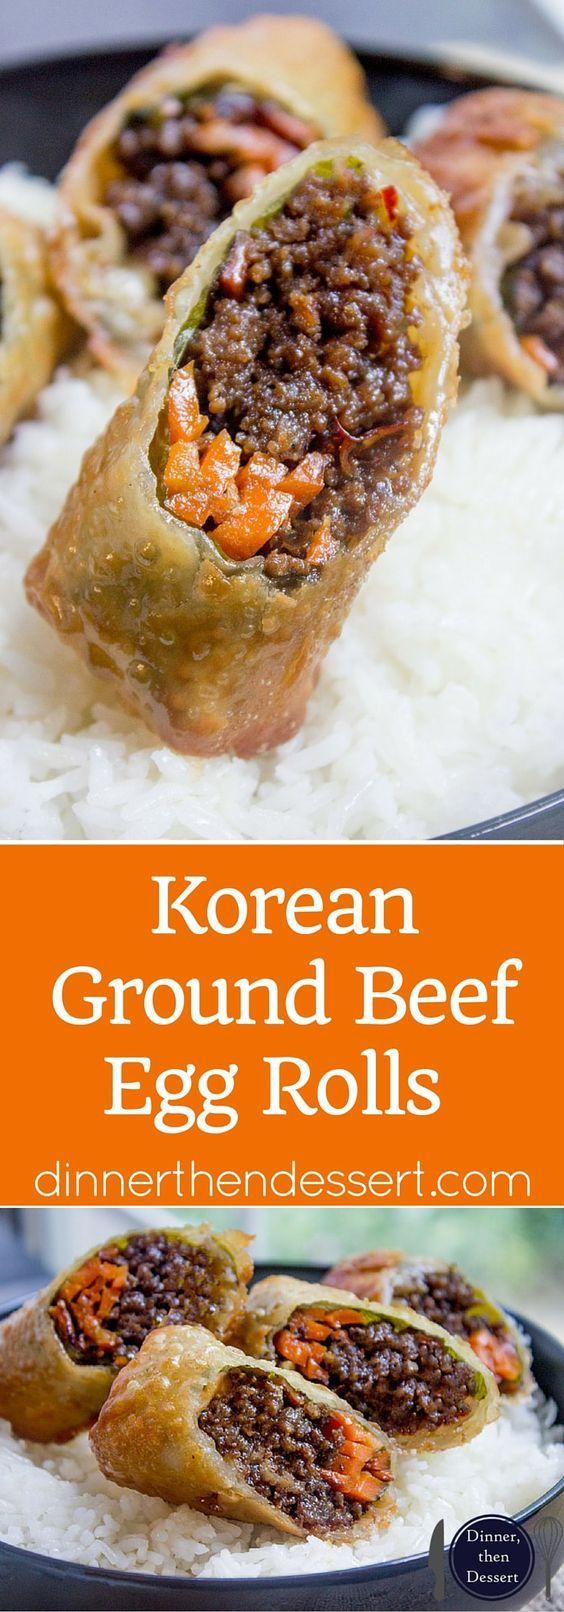 Korean Ground Beef Egg Rolls Dinner Then Dessert Appetizer Recipes Korean Ground Beef Recipes